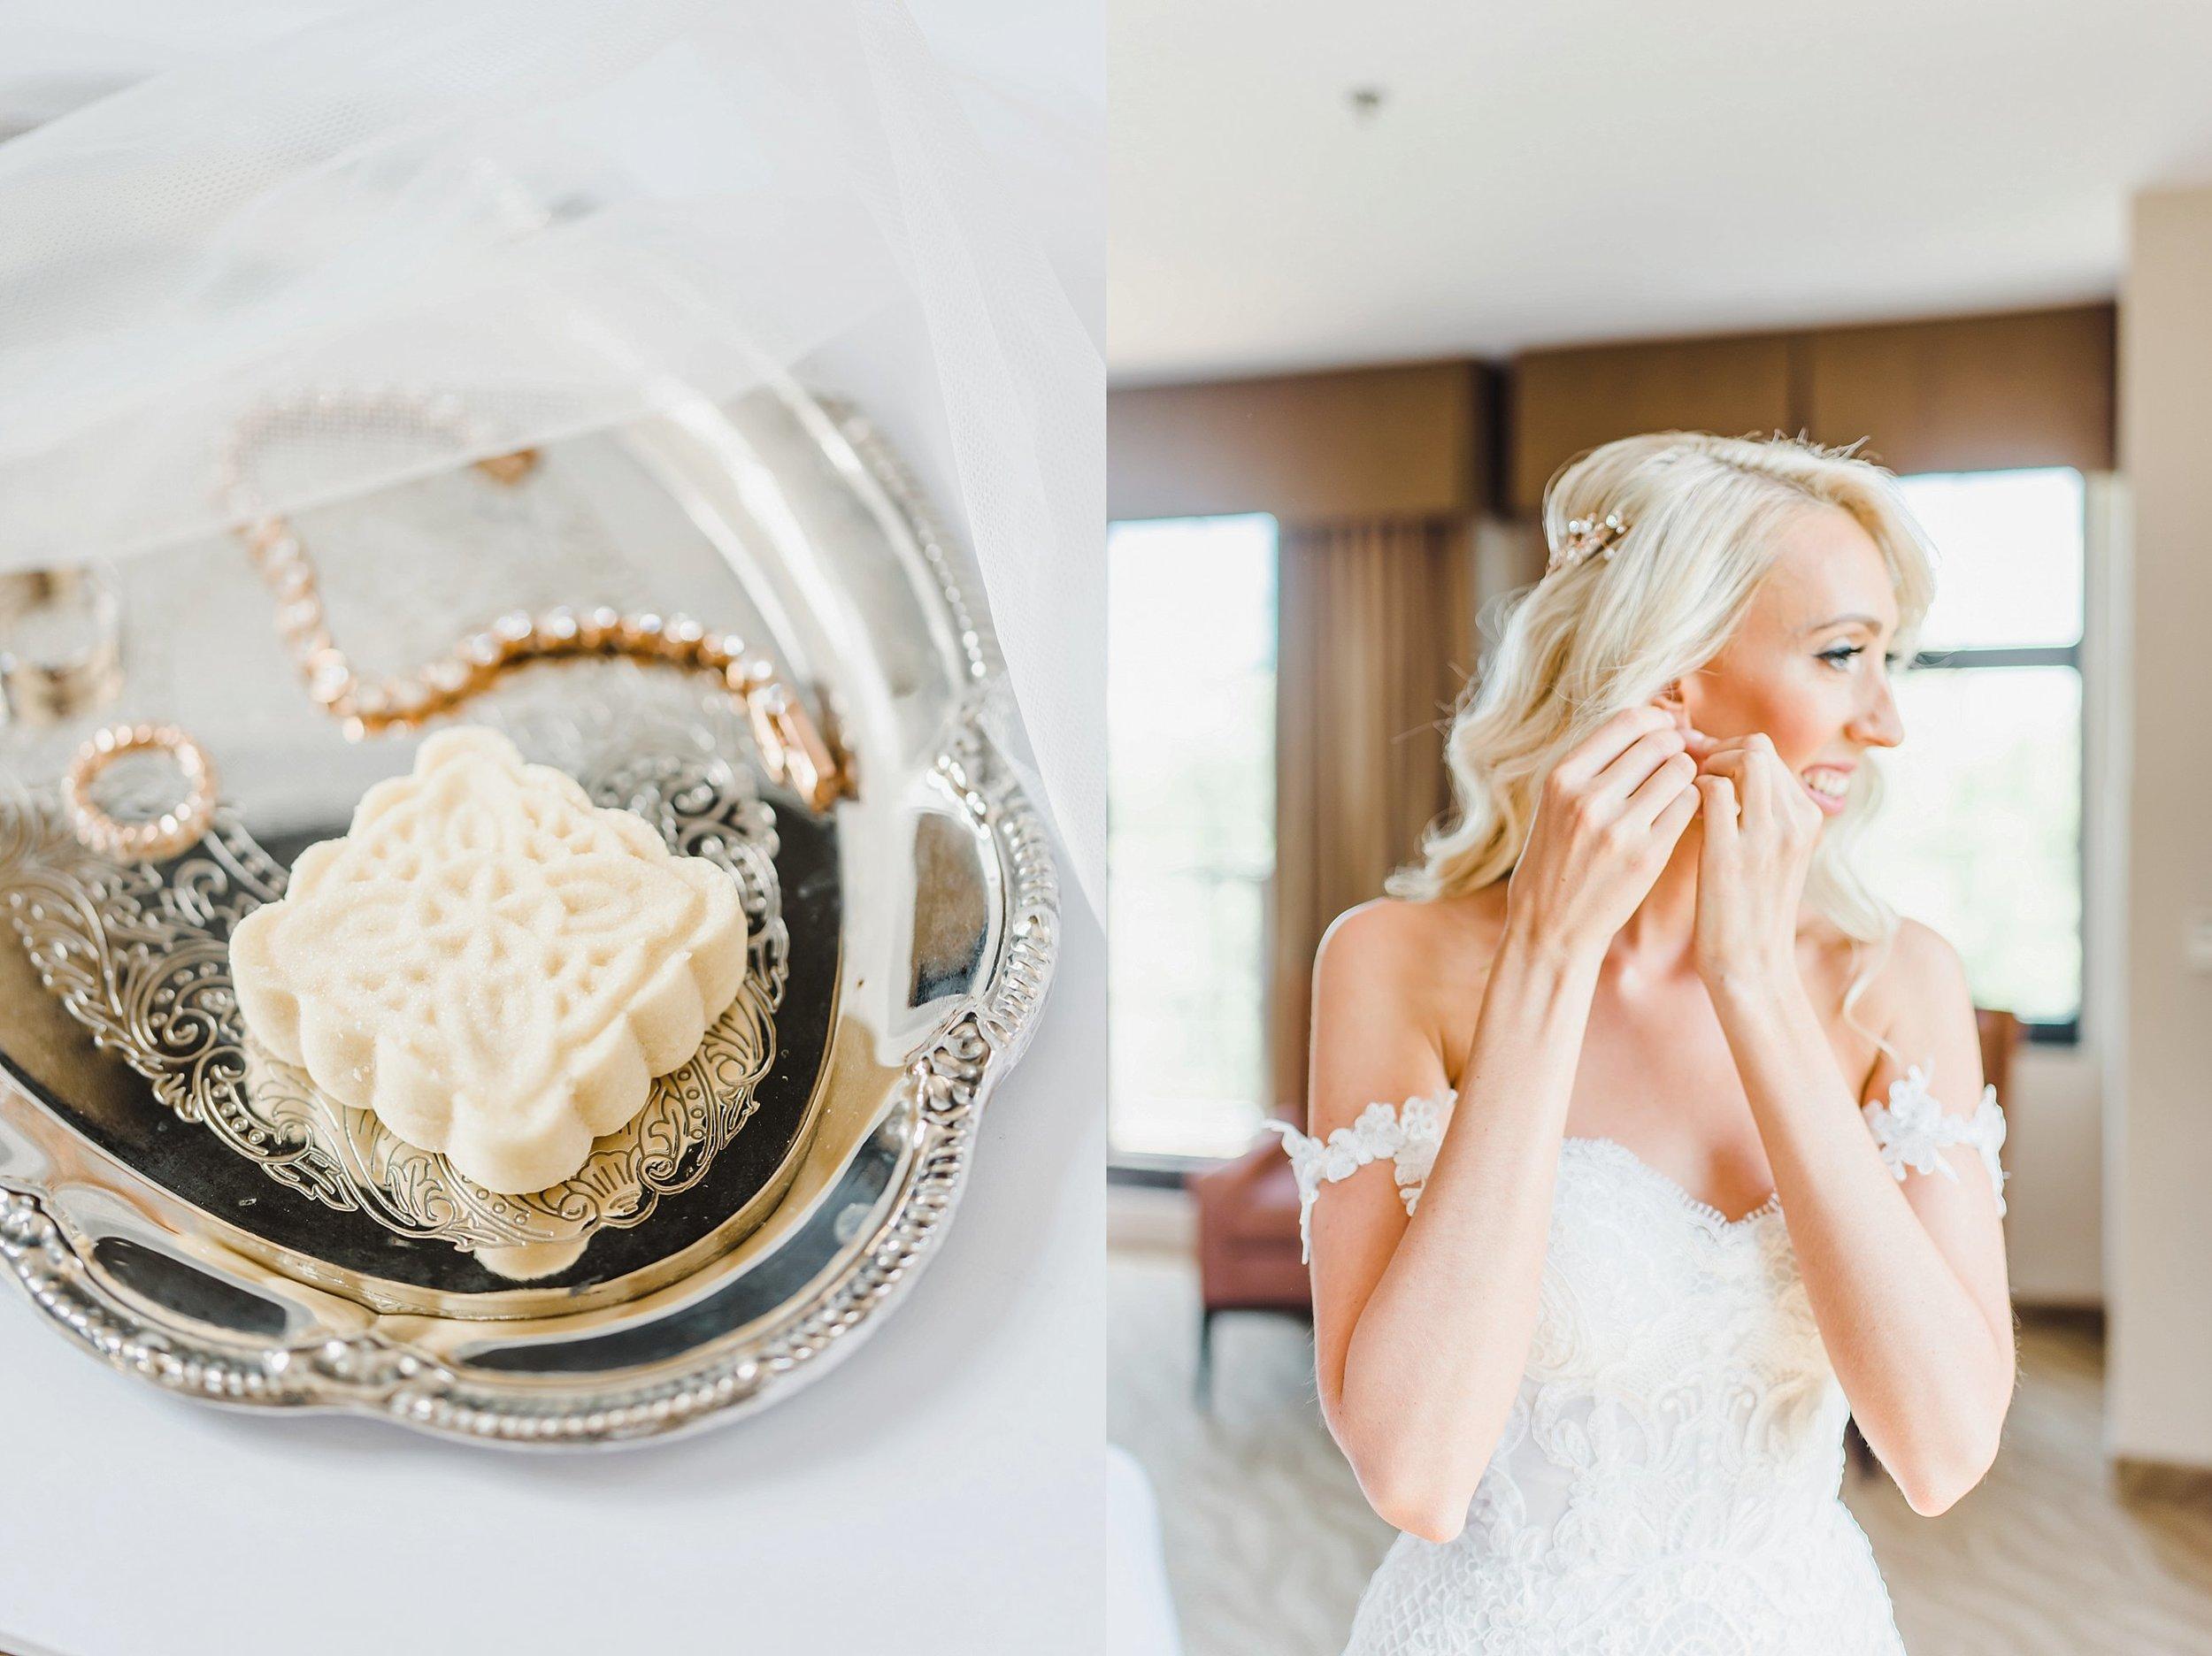 light airy indie fine art ottawa wedding photographer | Ali and Batoul Photography_0025.jpg